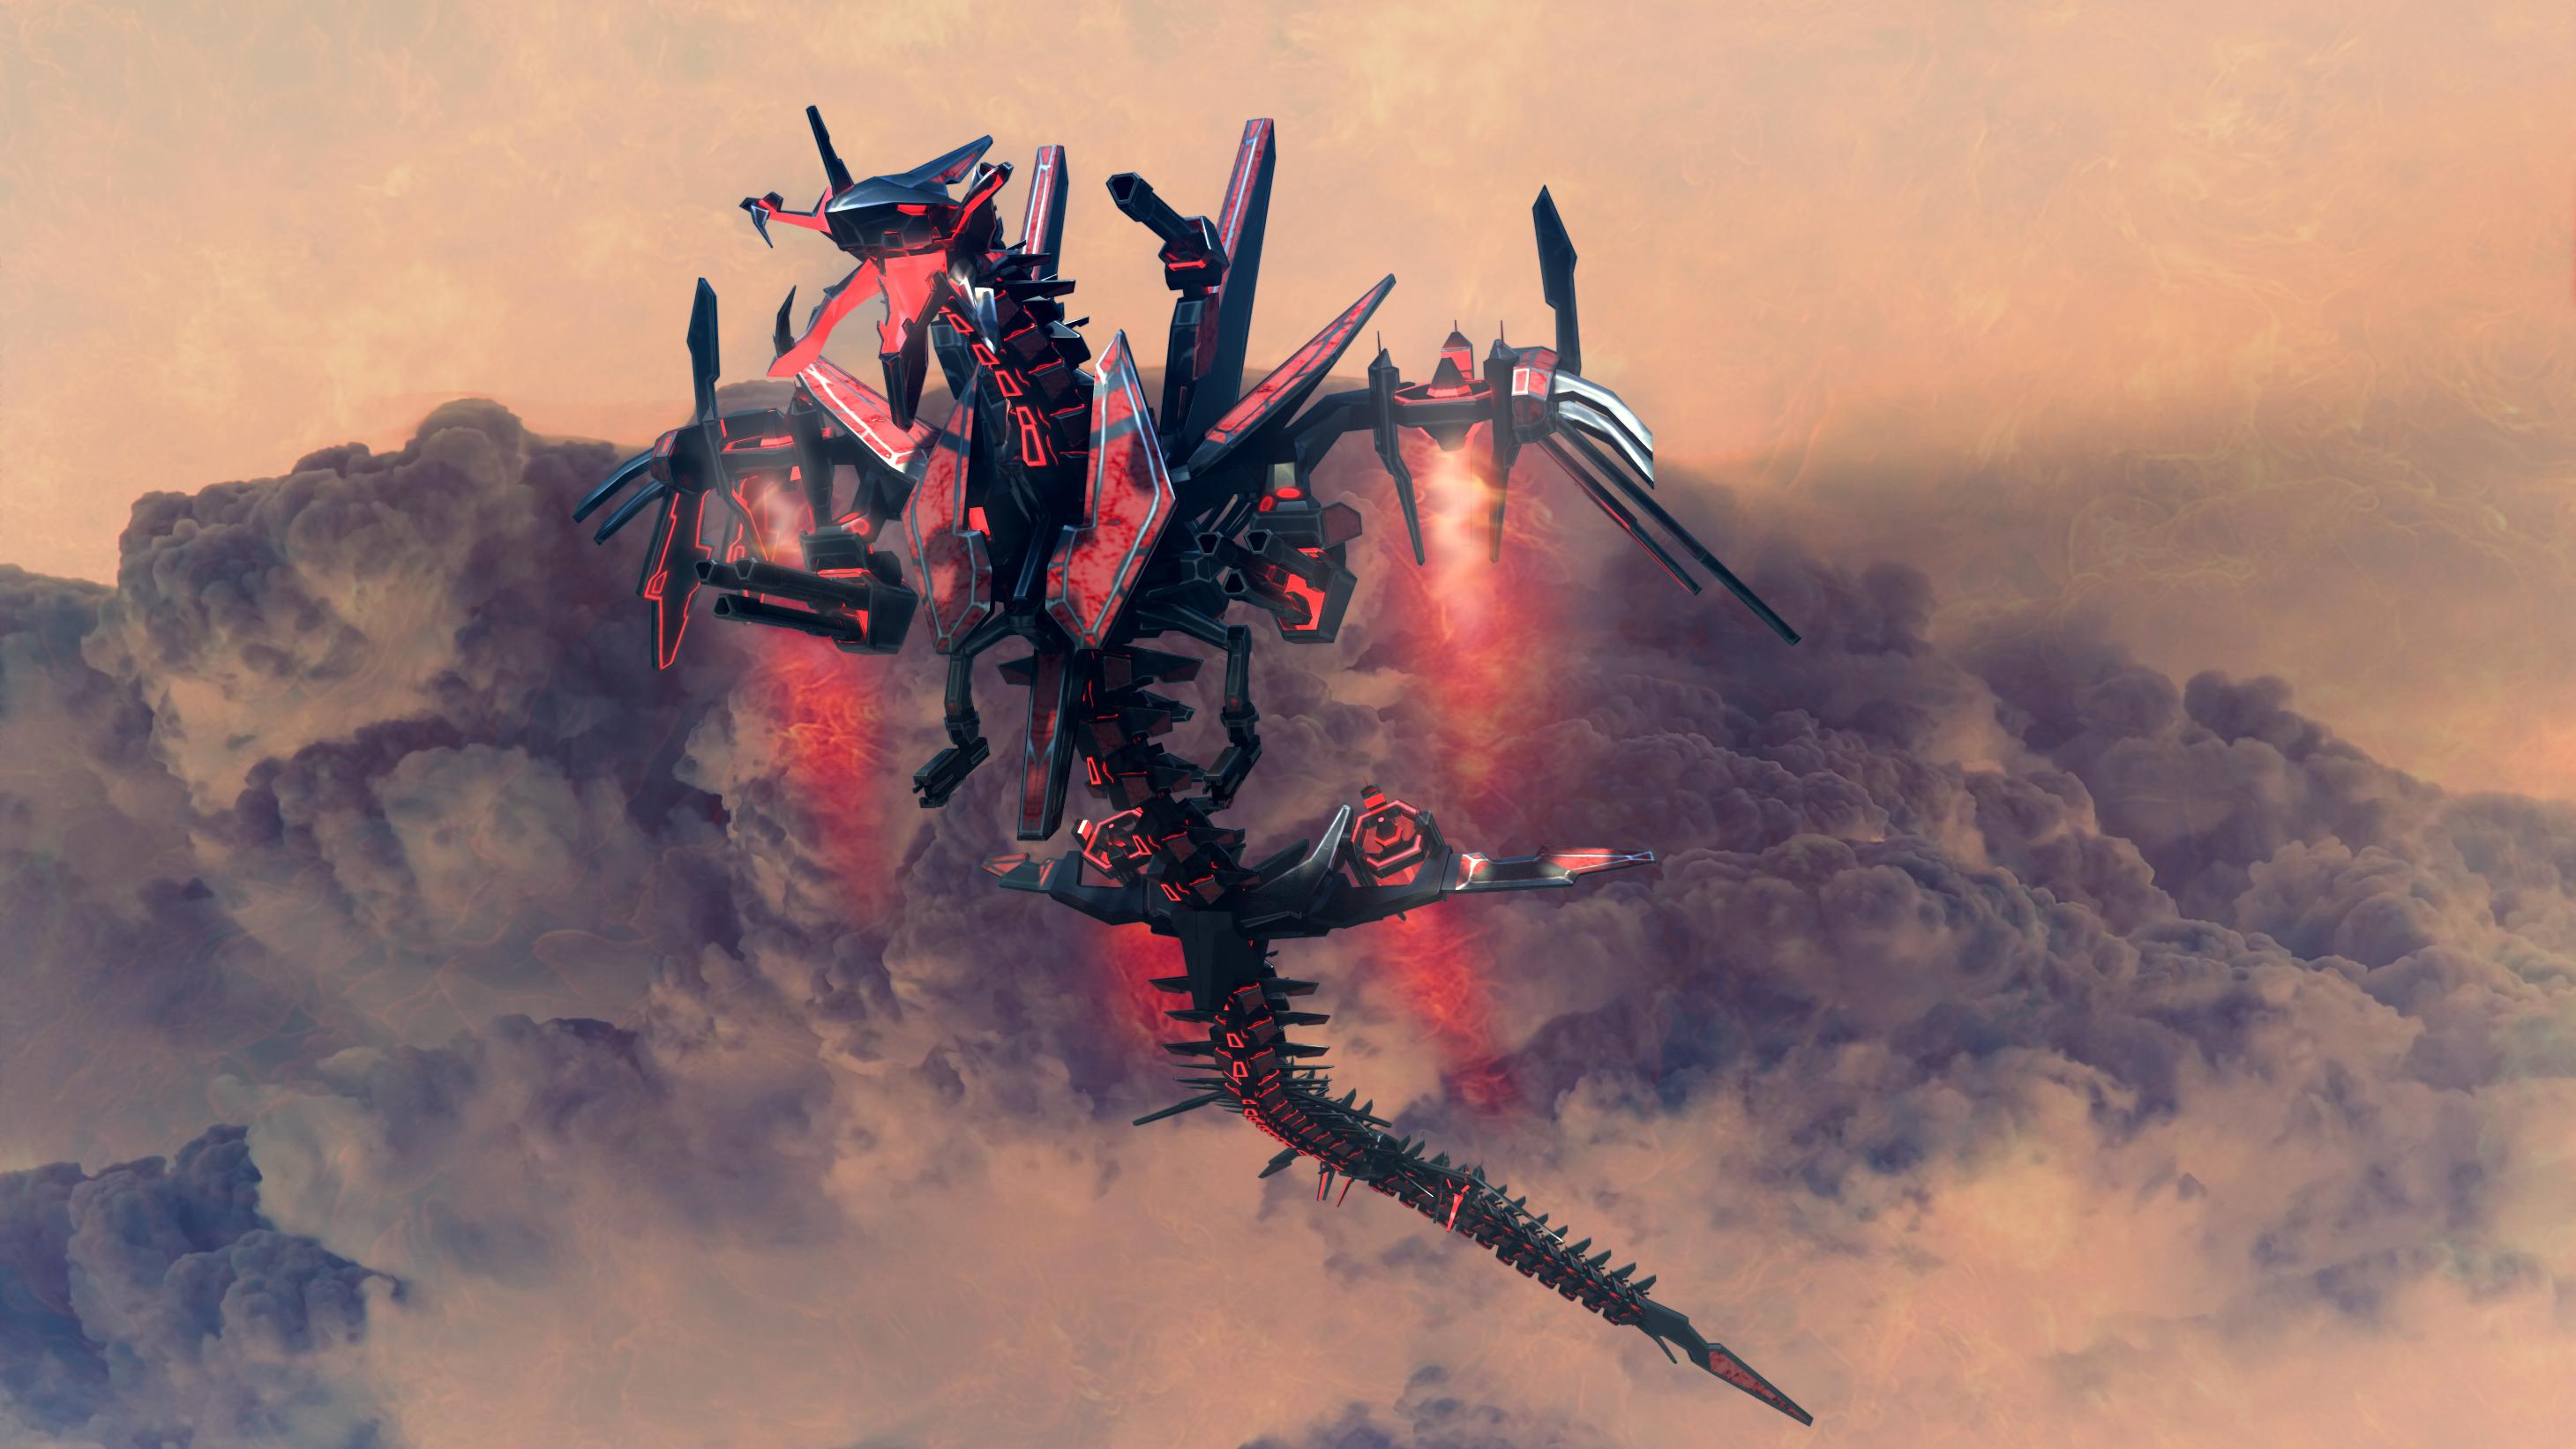 Cybran GOD LVL XP render 1 by Avitus12